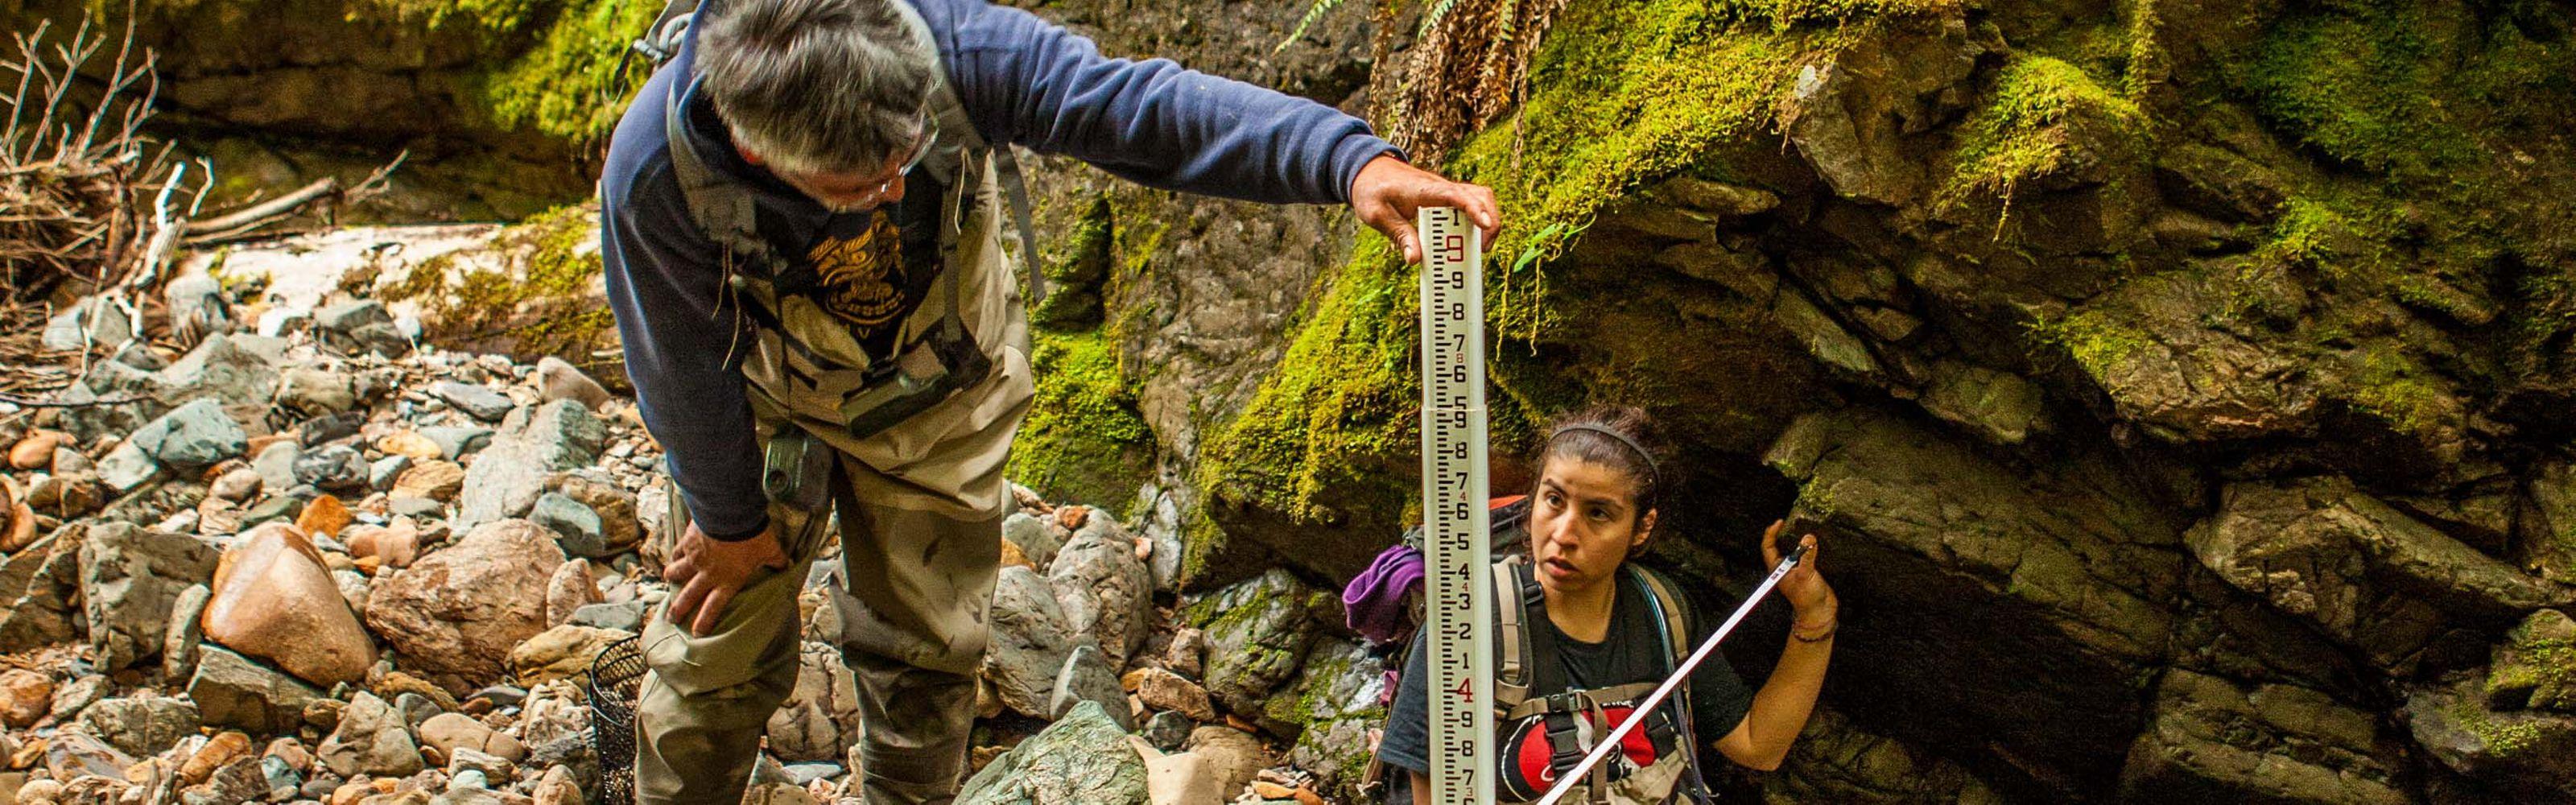 Members of the Haida tribe perform fish surveys on streams at Keat's Inlet on Prince of Wales Island, Alaska.